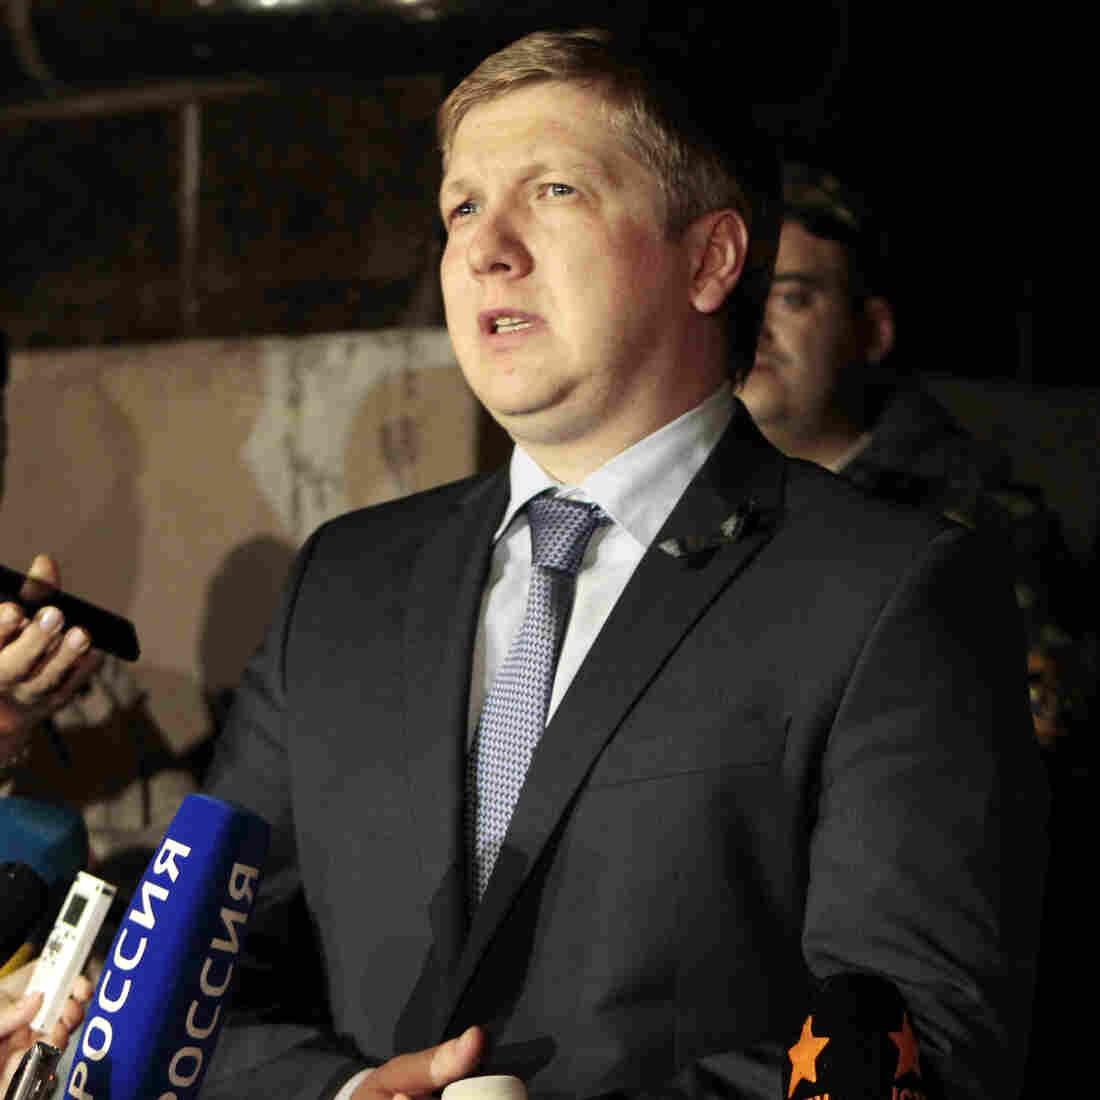 In Escalation, Russia Cuts Gas Supplies To Ukraine